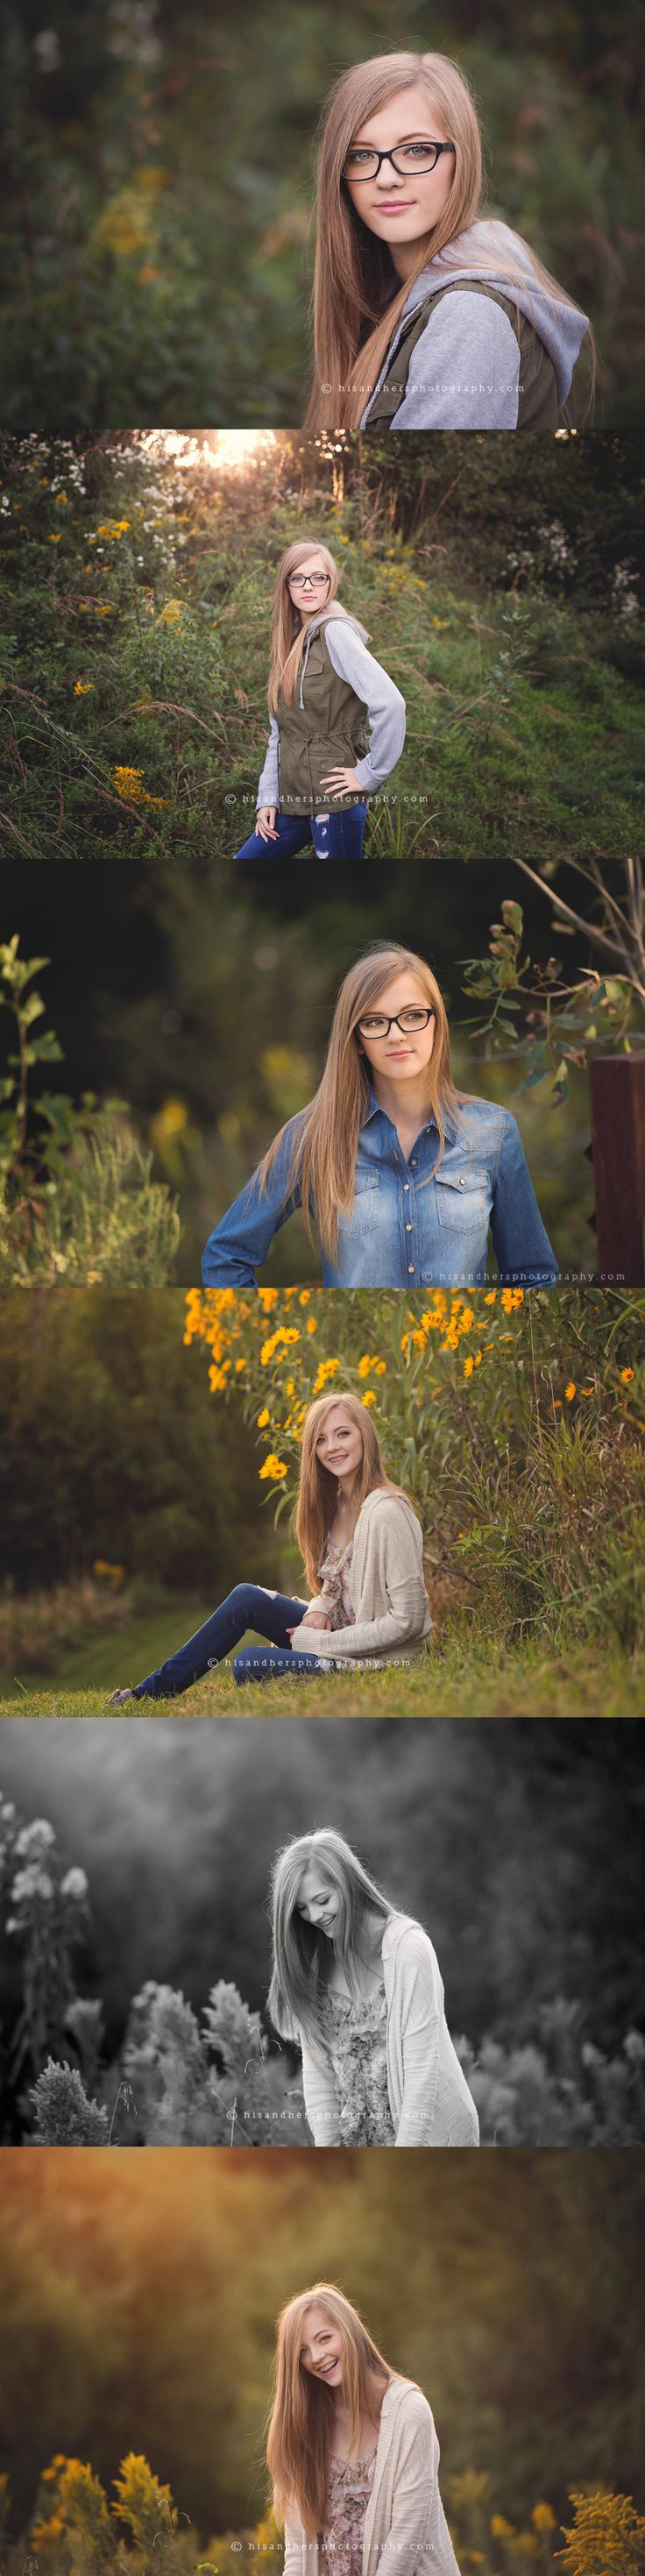 Des Moines, Iowa senior portrait photographer, Randy Milder | His and Hers #seniorpictures #seniorpics